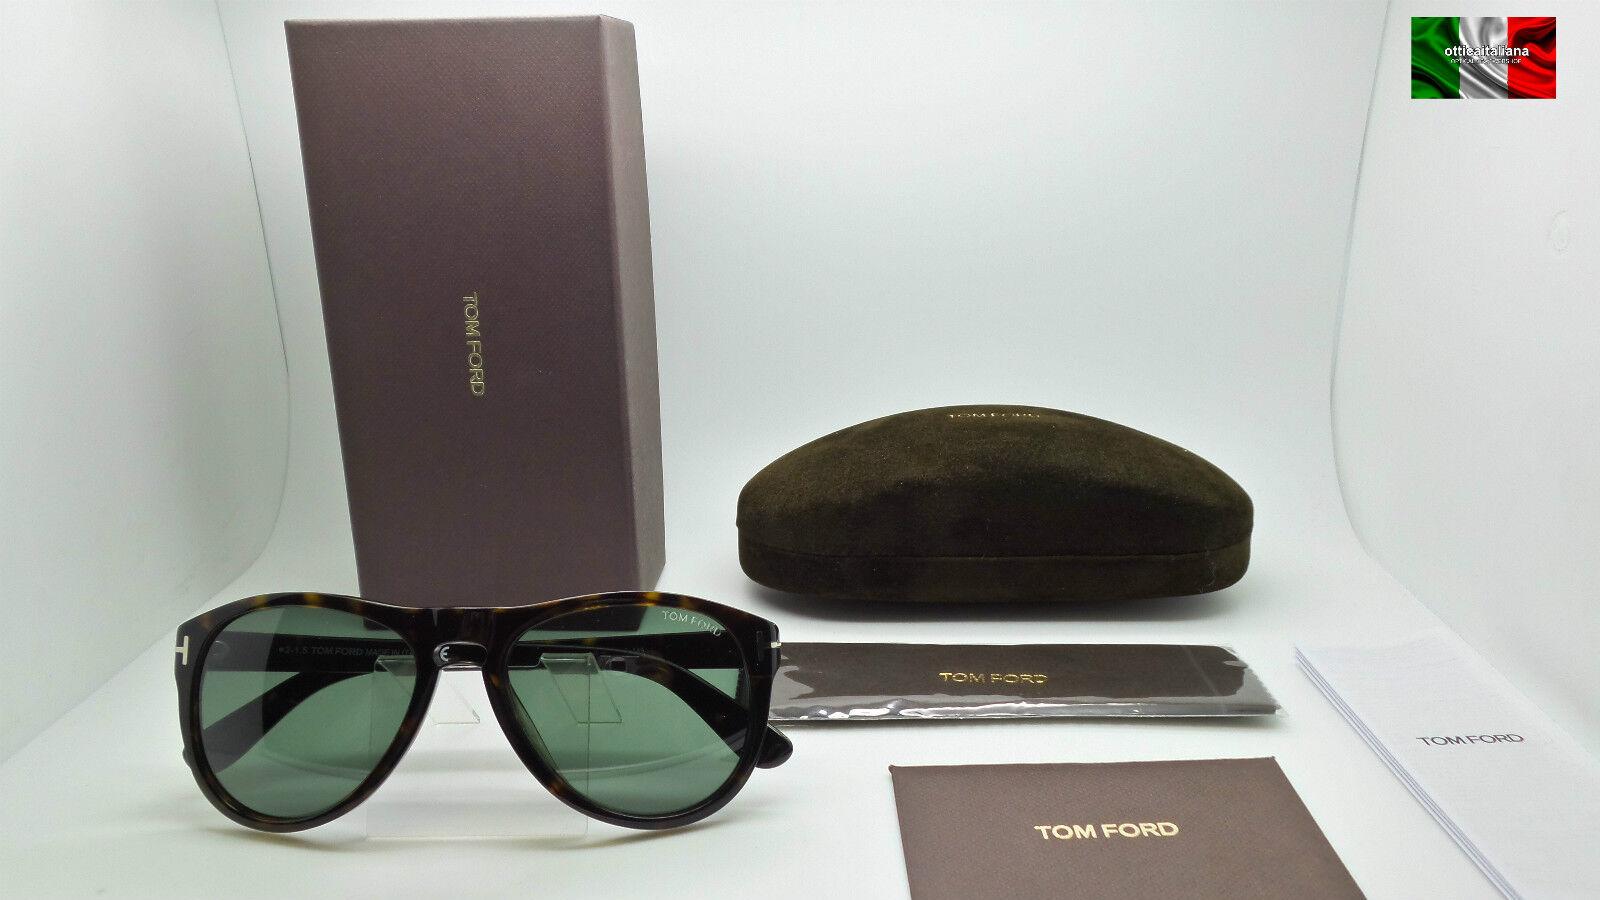 e5d710b302 Tom Ford TF 347 Kurt 56r Havana Green Authentic Sunglasses Rl917